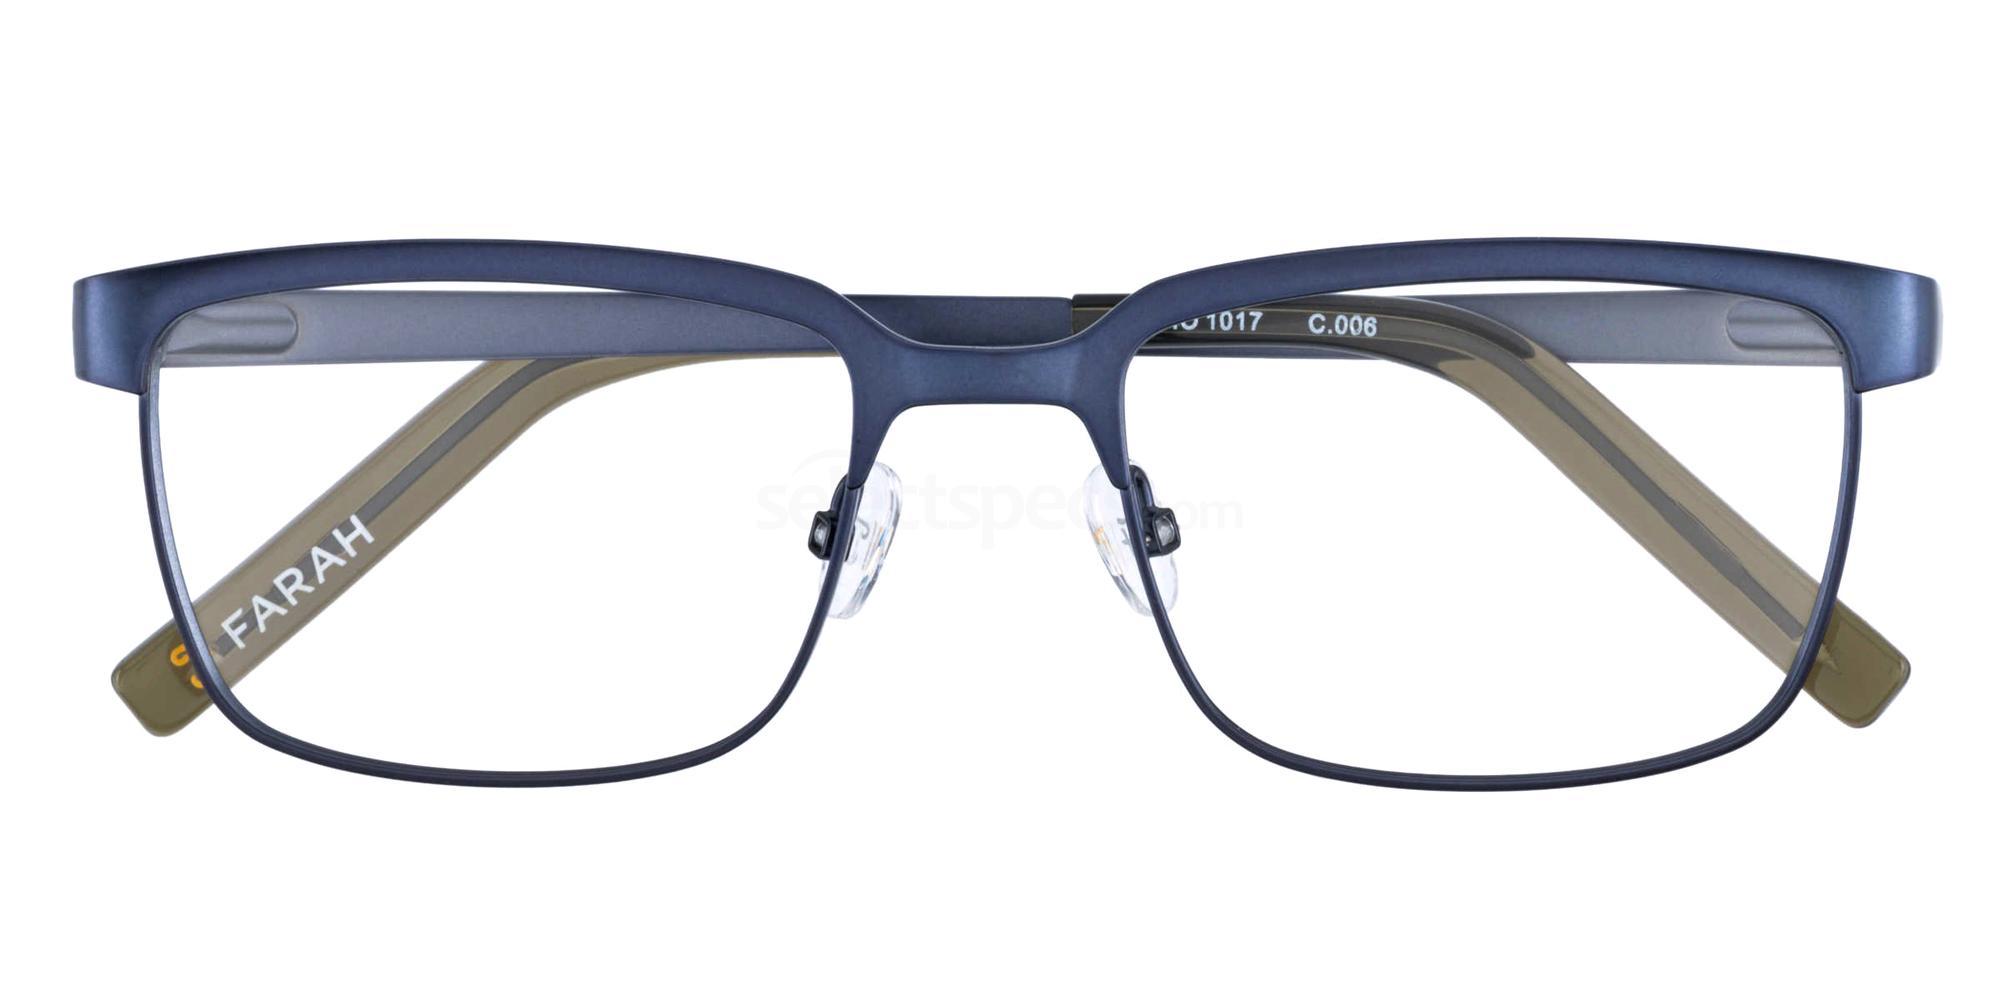 006 FHO-1017 Glasses, Farah